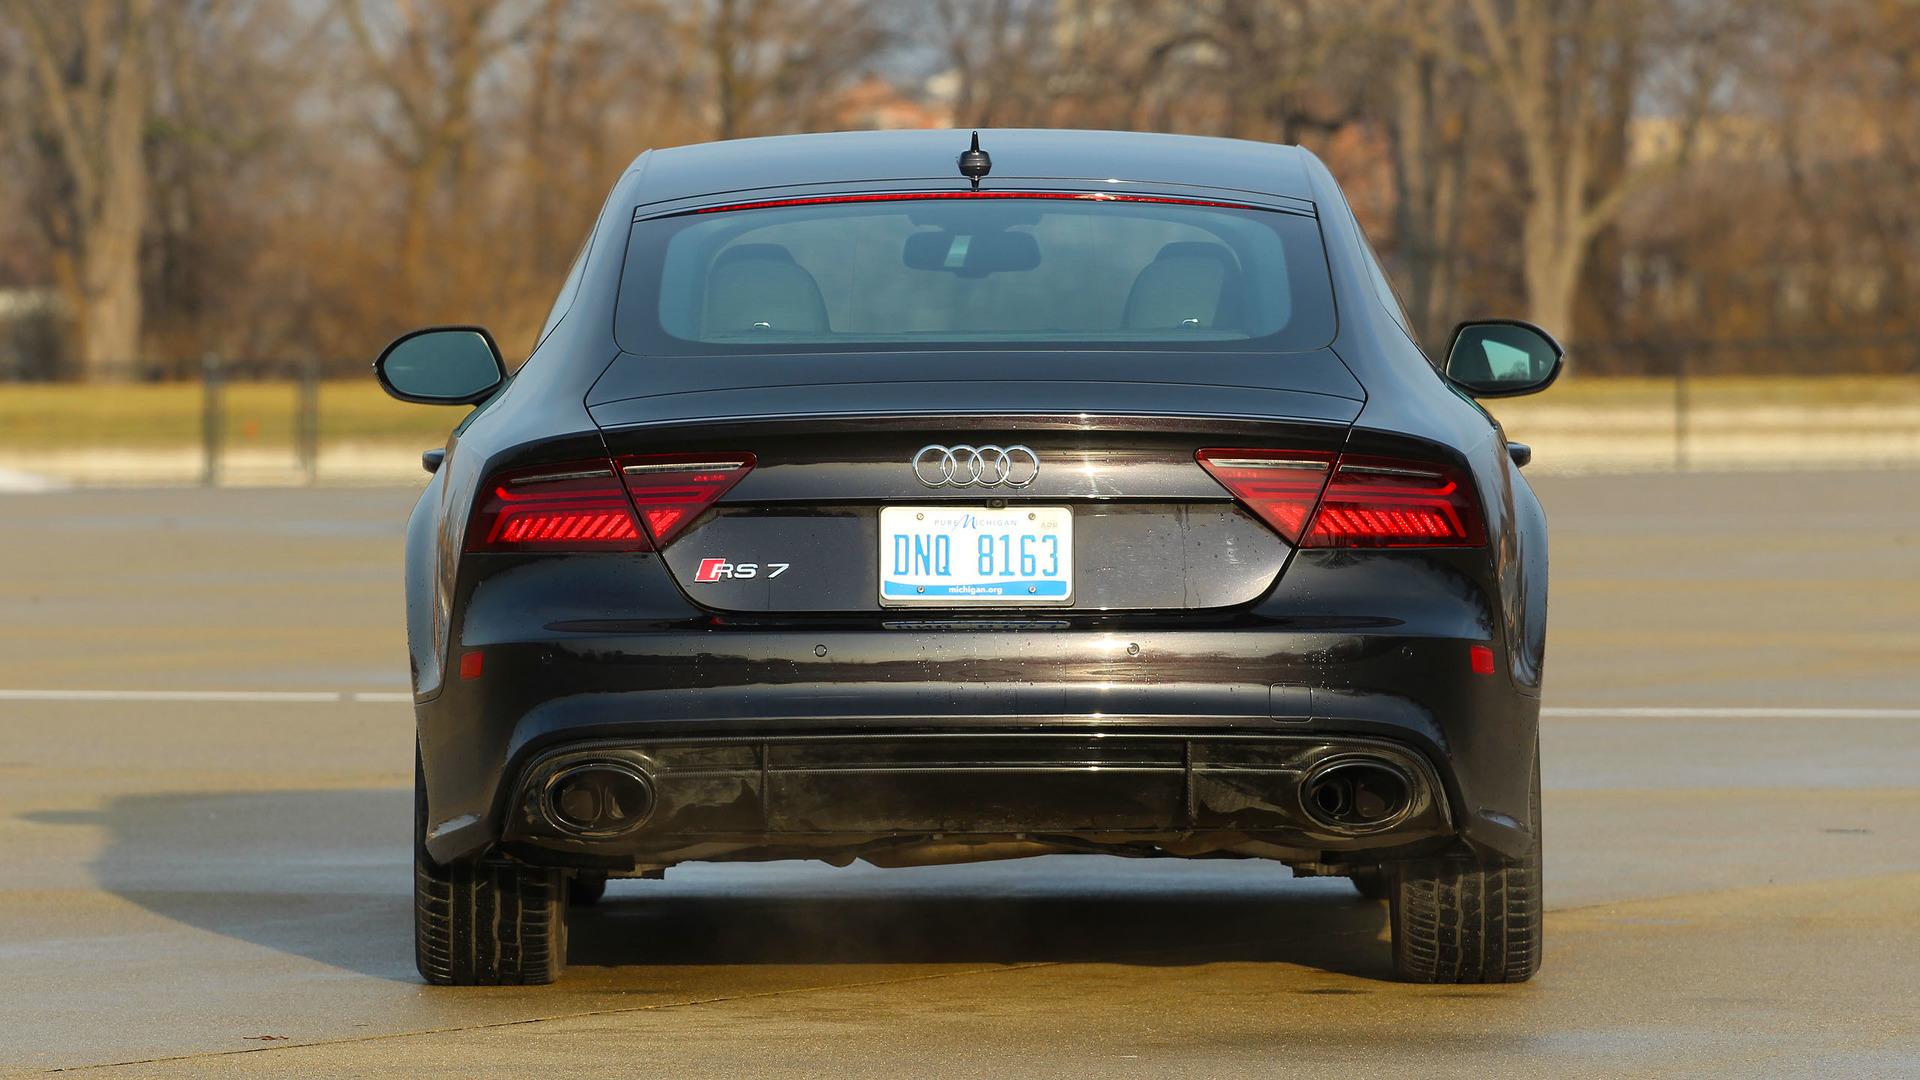 Kekurangan Audi Rs7 2017 Harga